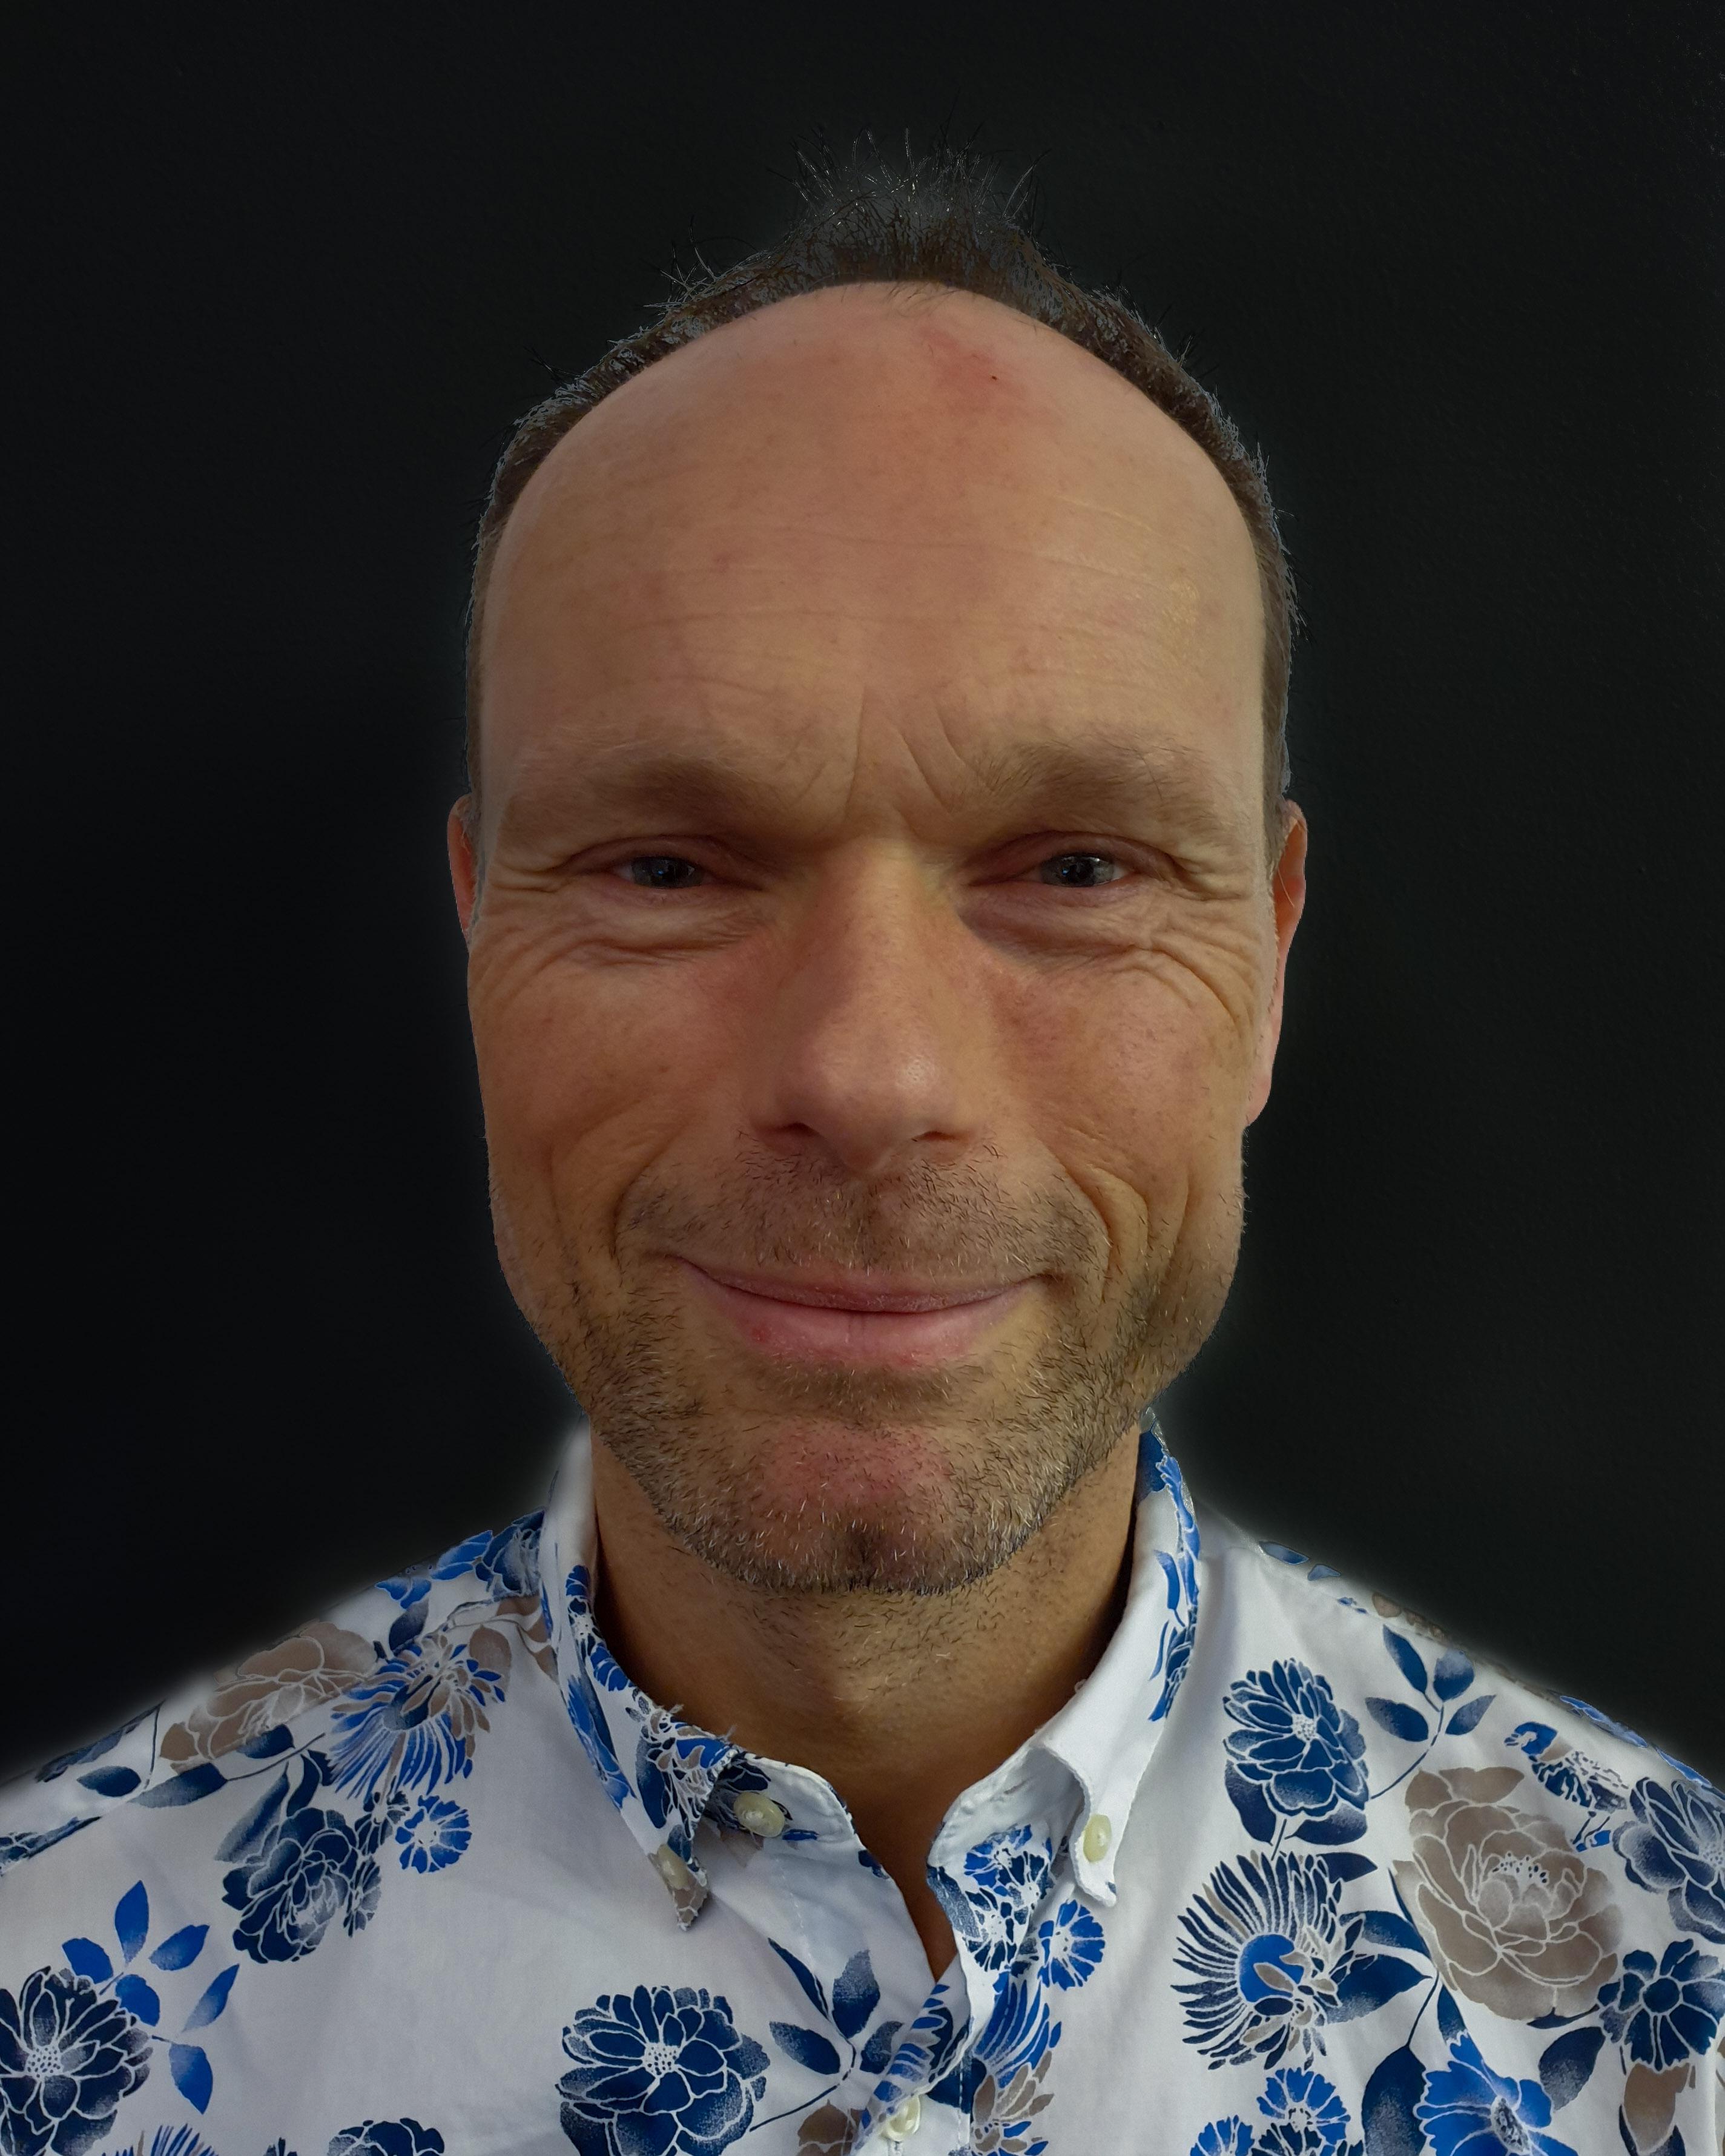 Svein Magne Løvås